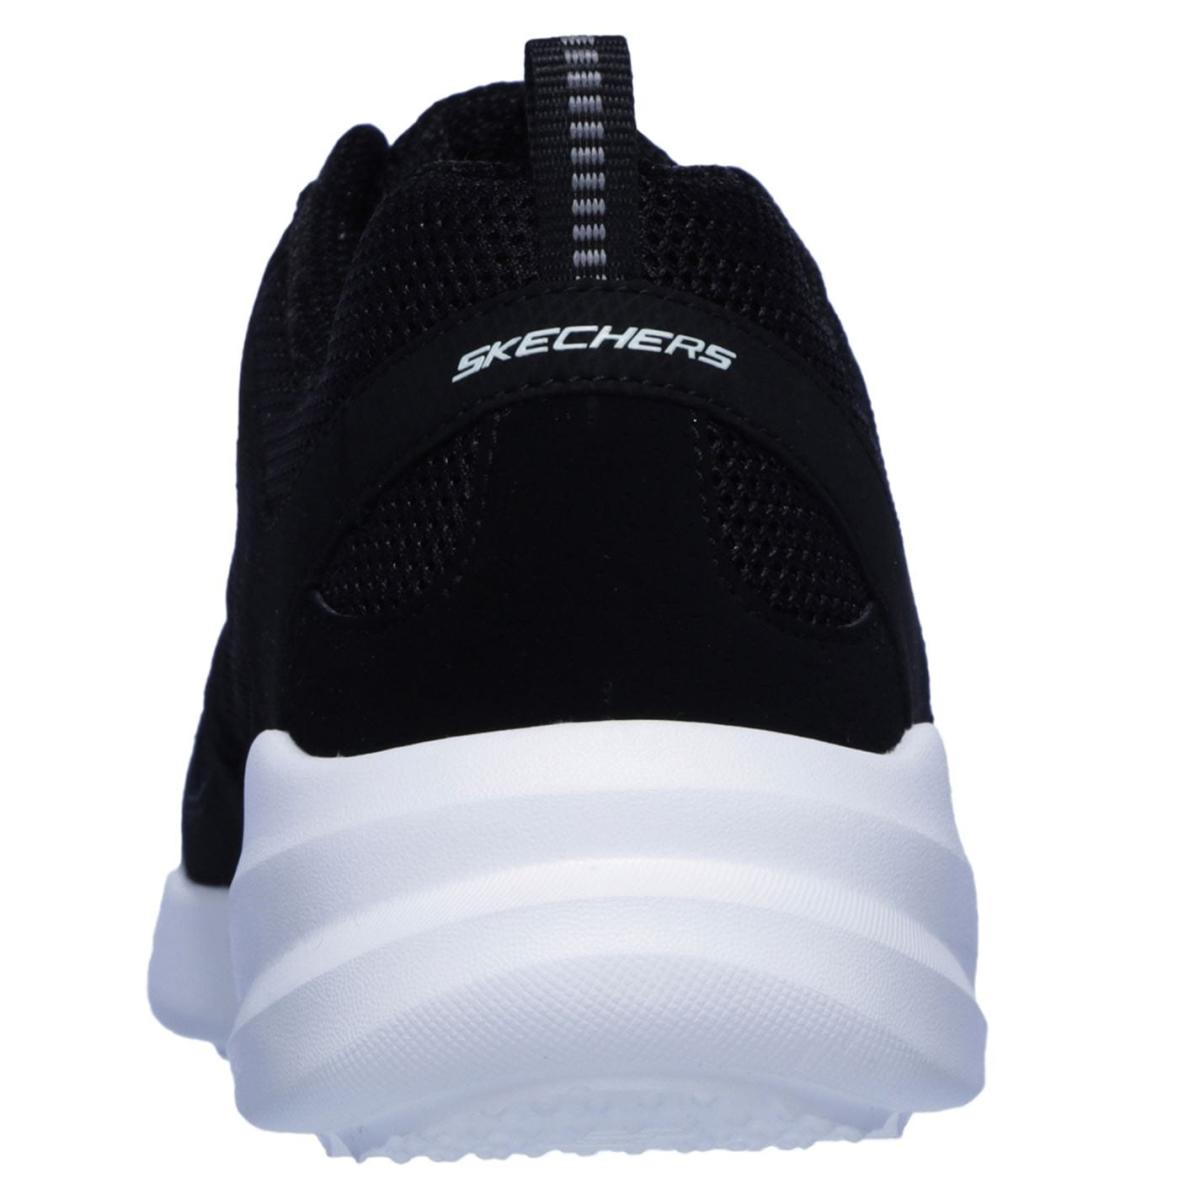 Skechers-Skybound-Turnschuhe-Laufschuhe-Damen-Sportschuhe-Sneaker-1398 Indexbild 6